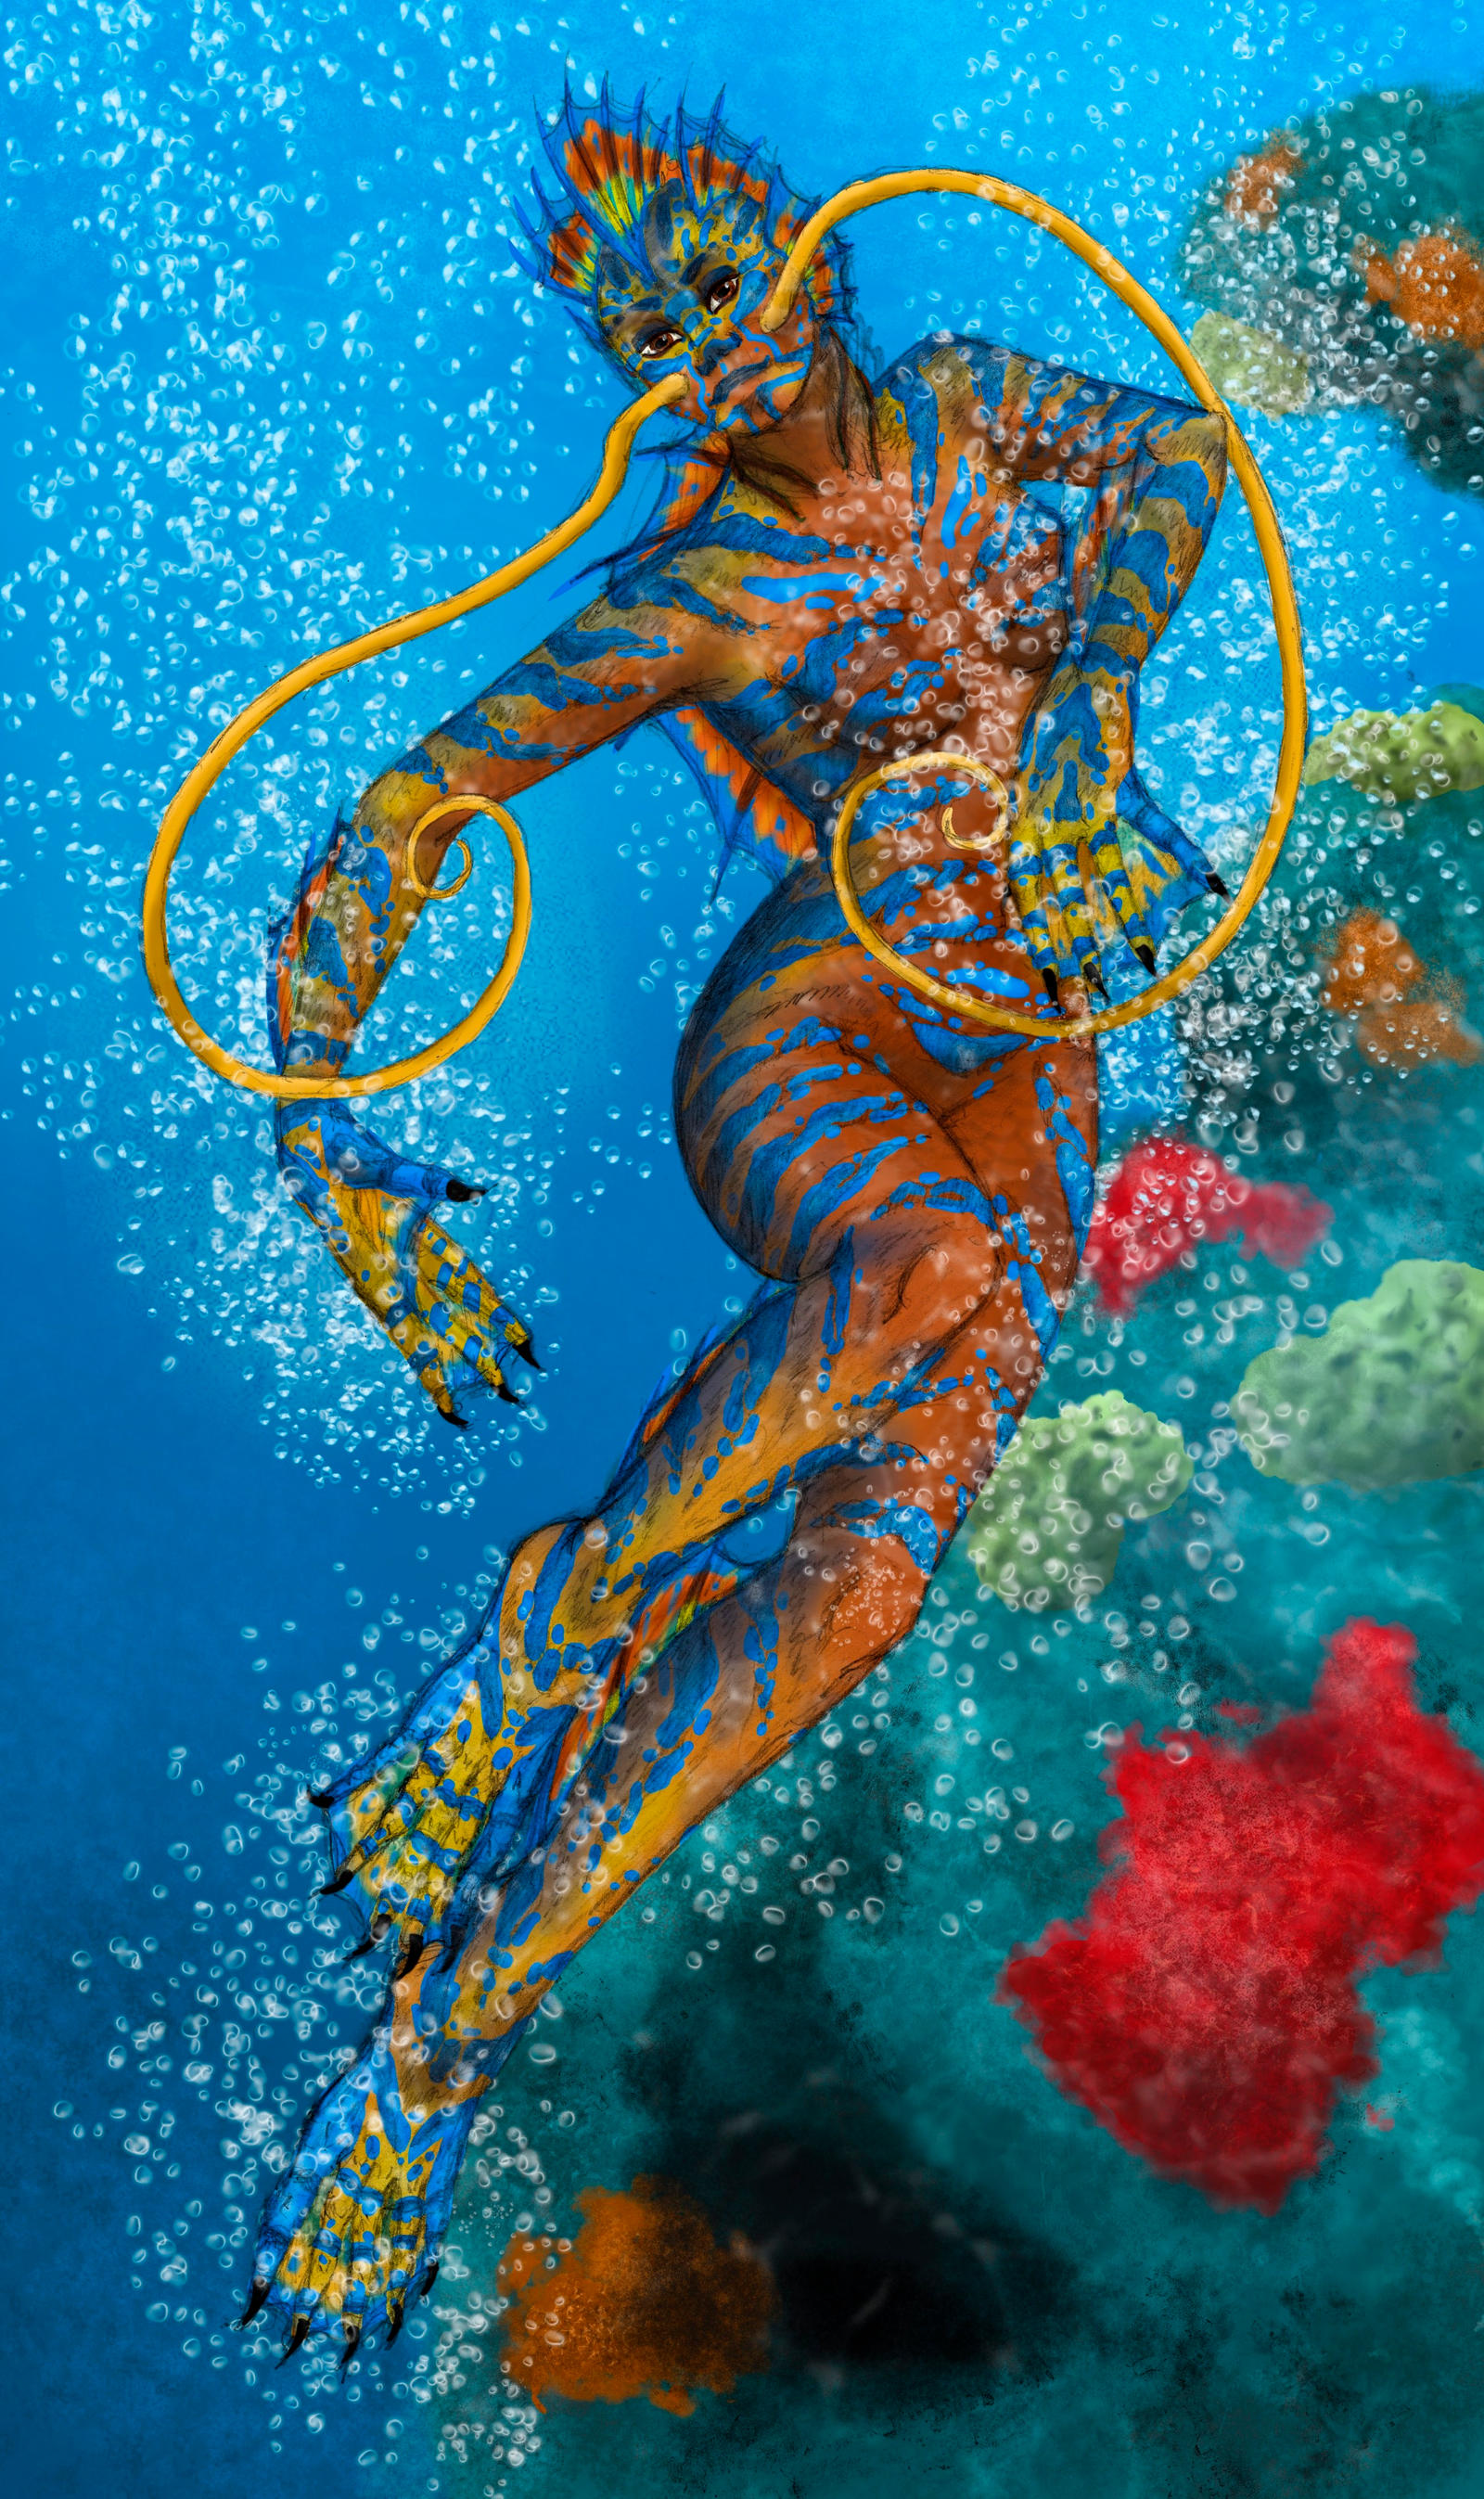 Parrotfish by dreamofwings